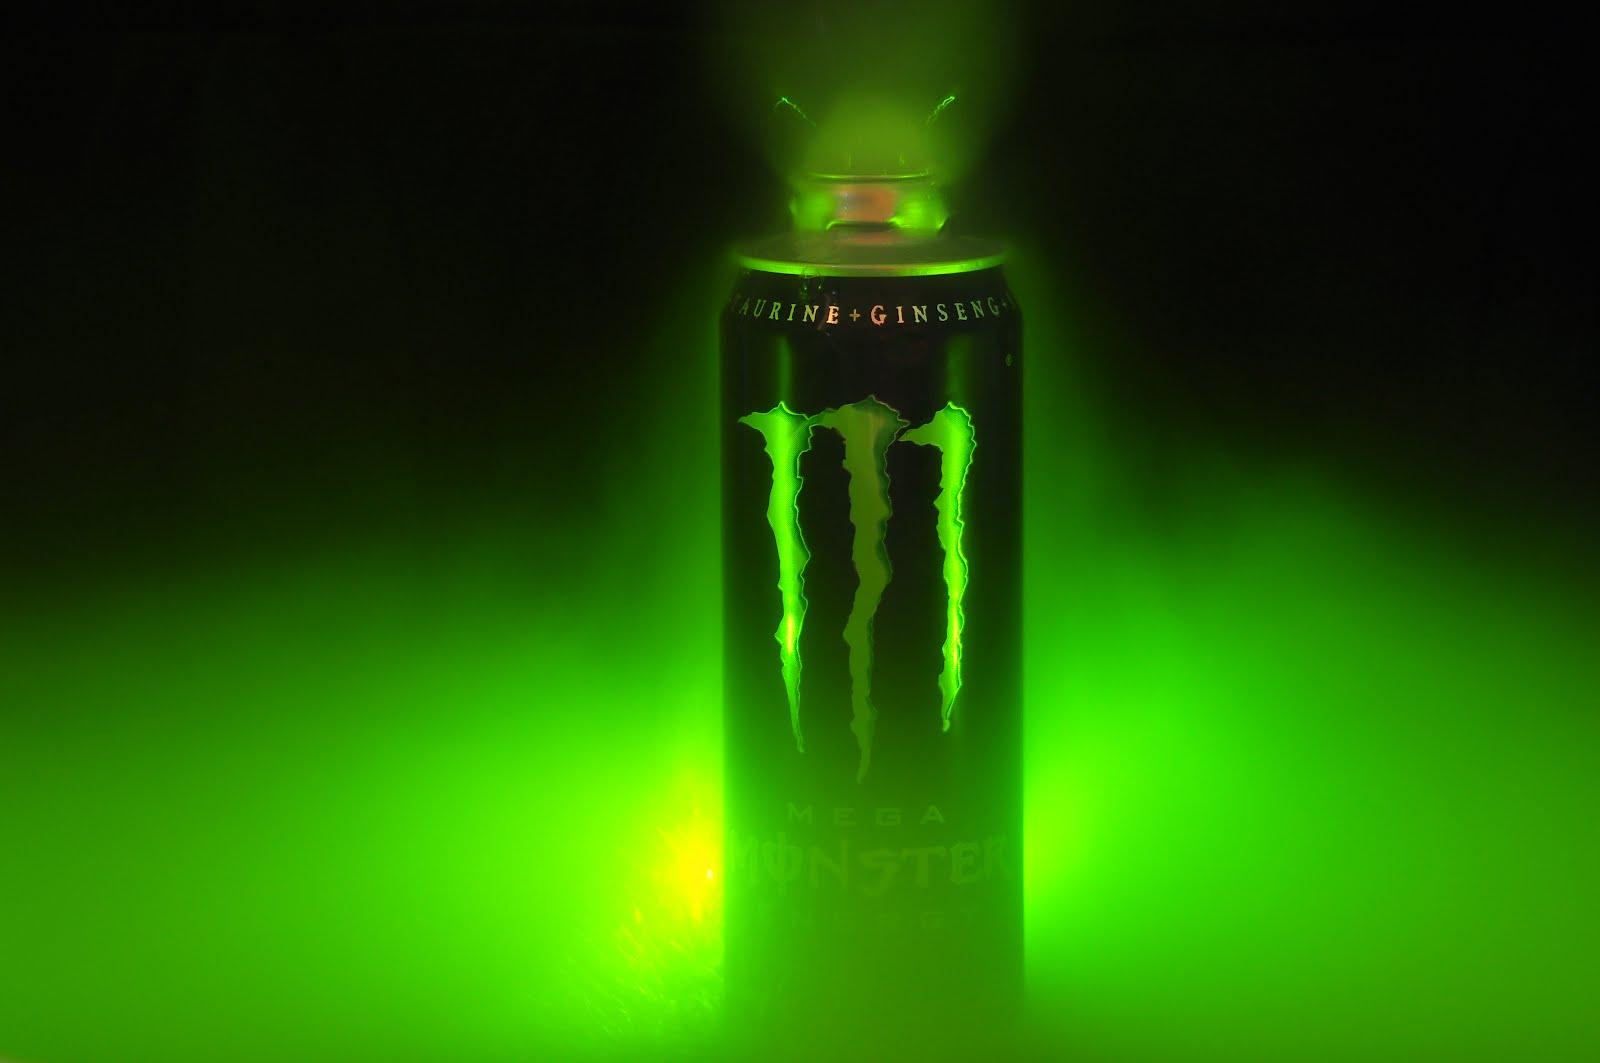 Monster Energy Drink Backgrounds - WallpaperSafari